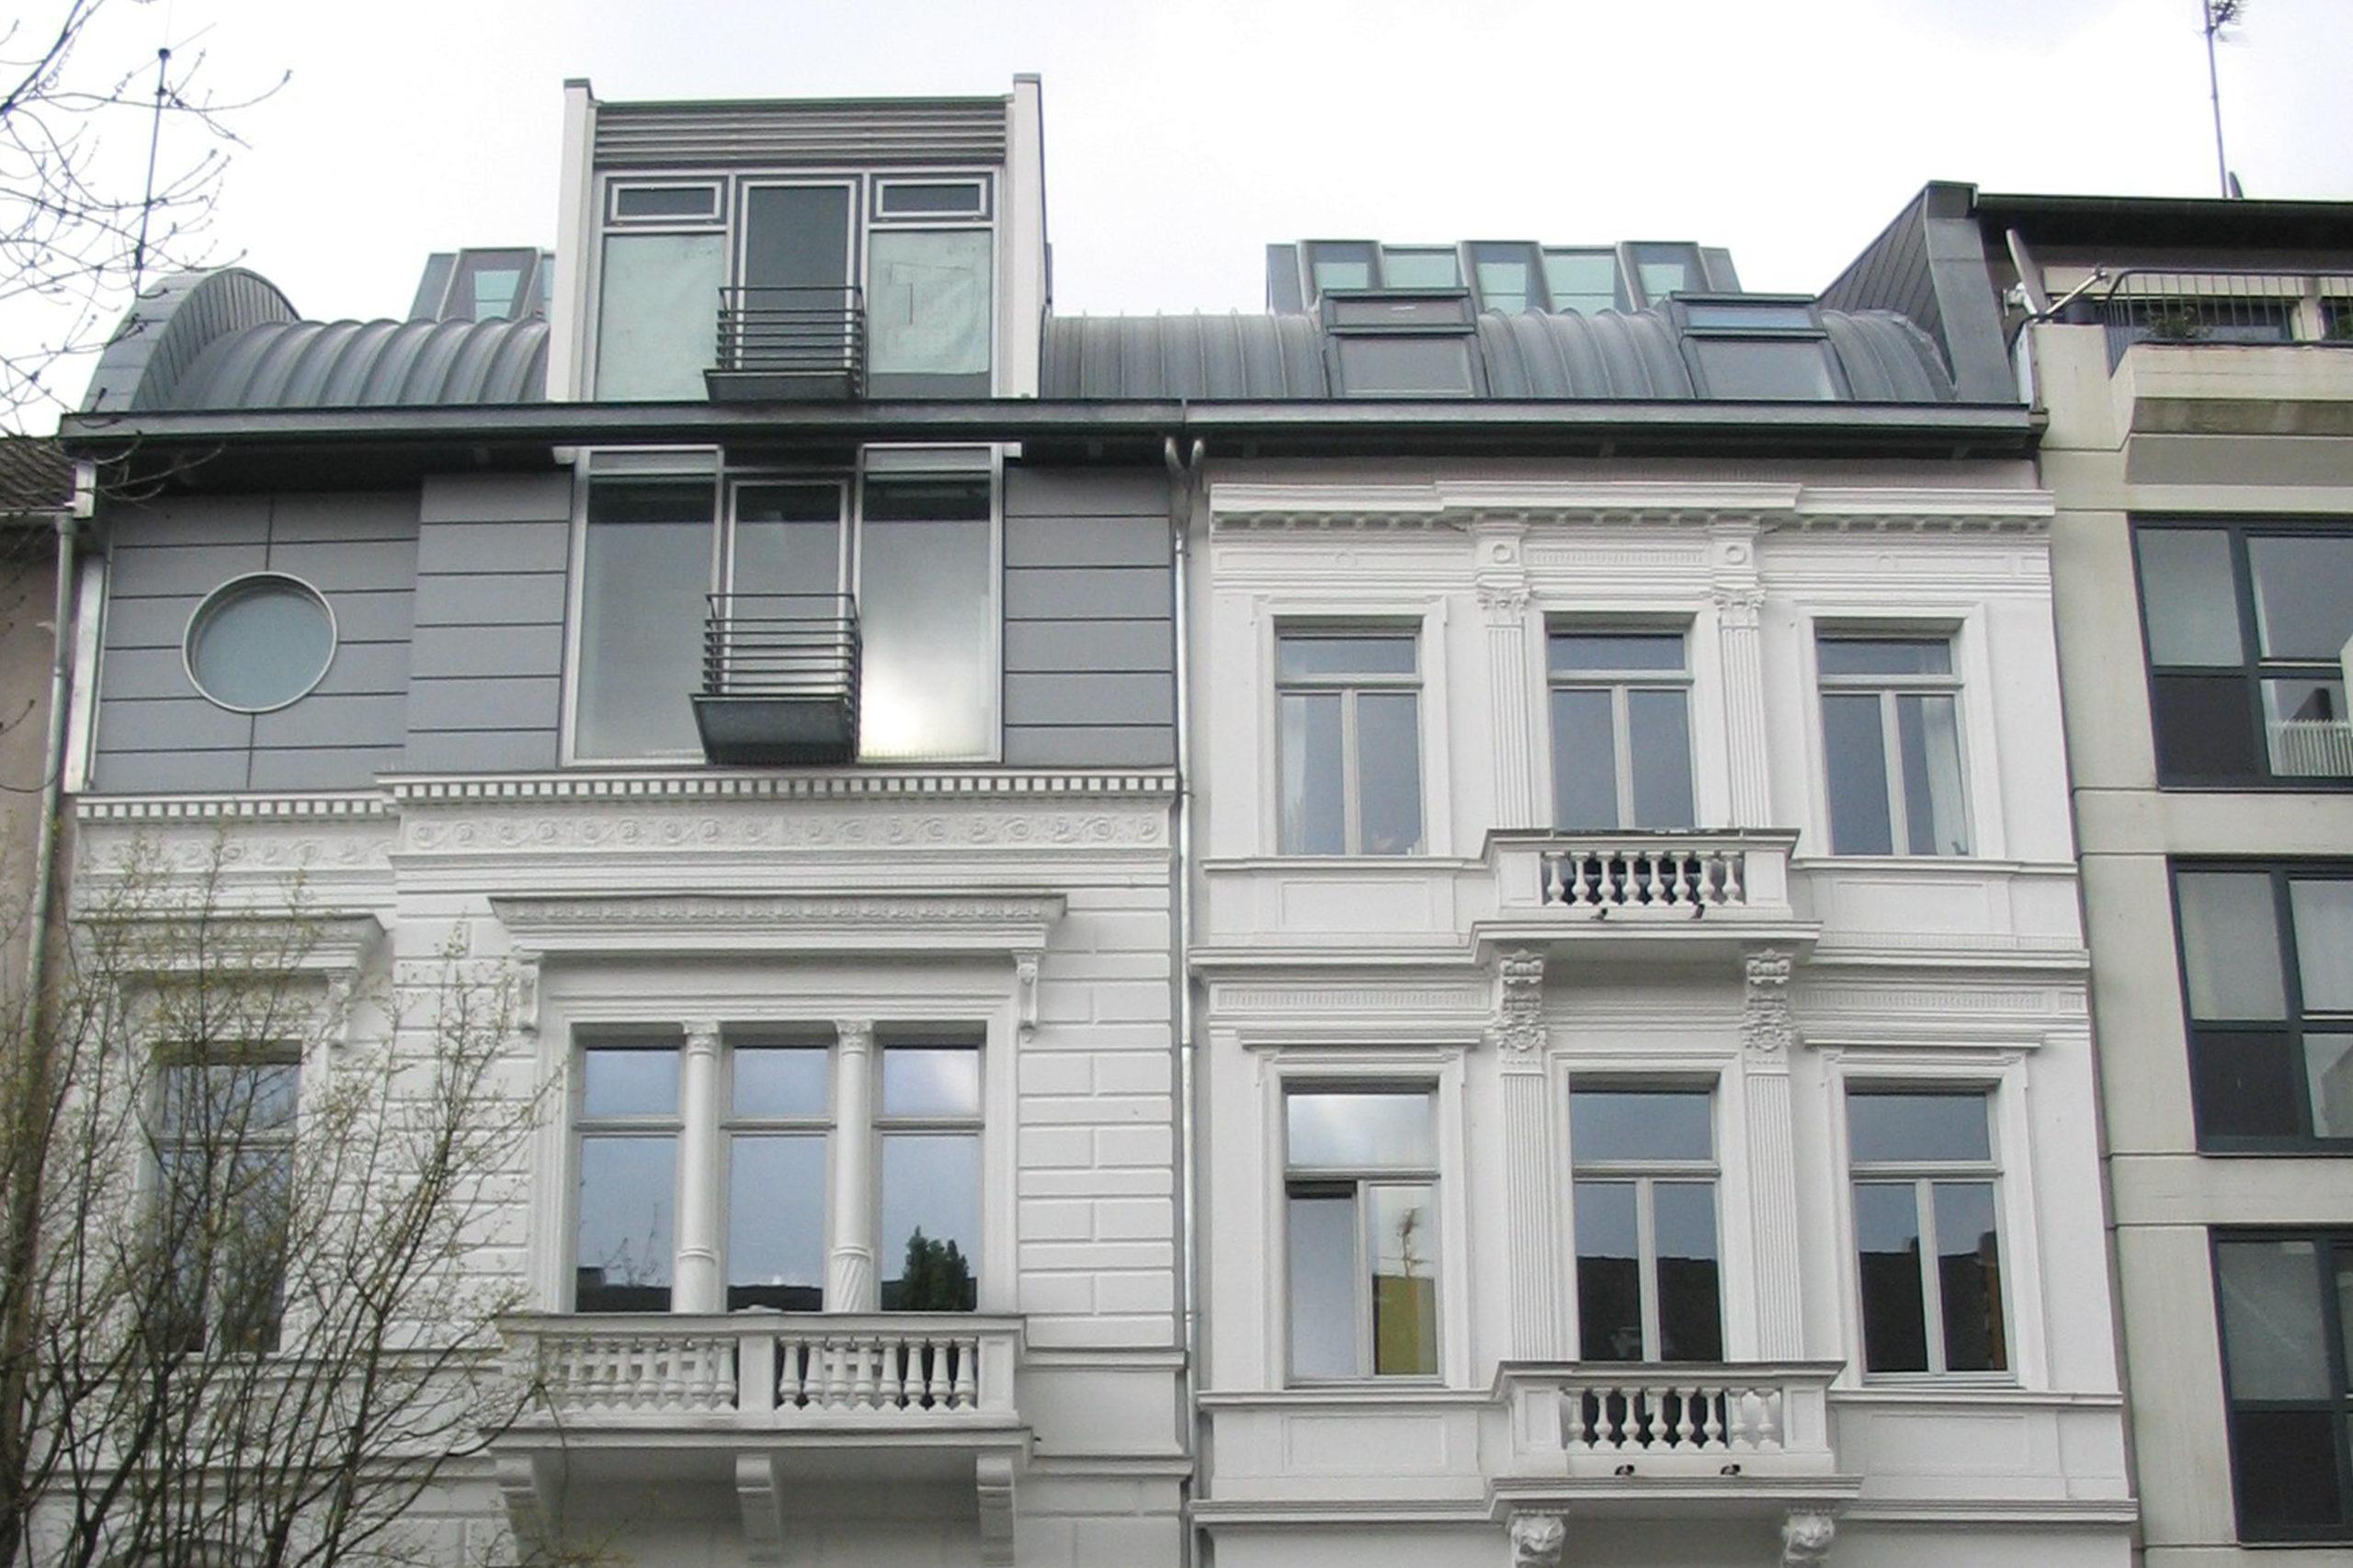 Zimmermann Architekten+ Aachen I Lousbergstrasse, Aachen